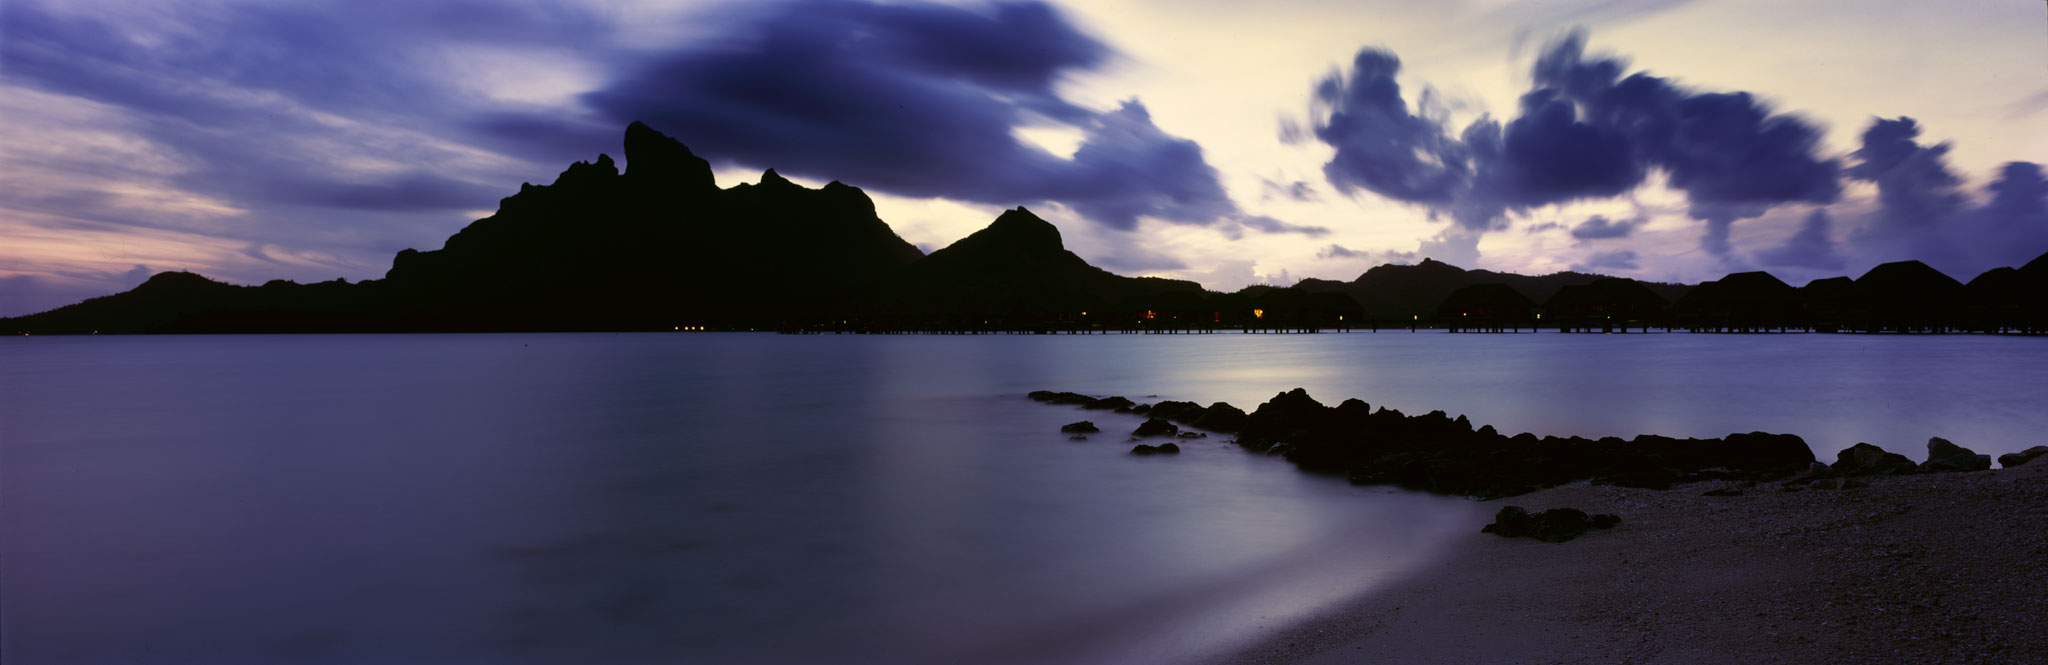 Mt. Otemanu at dusk : Bora Bora